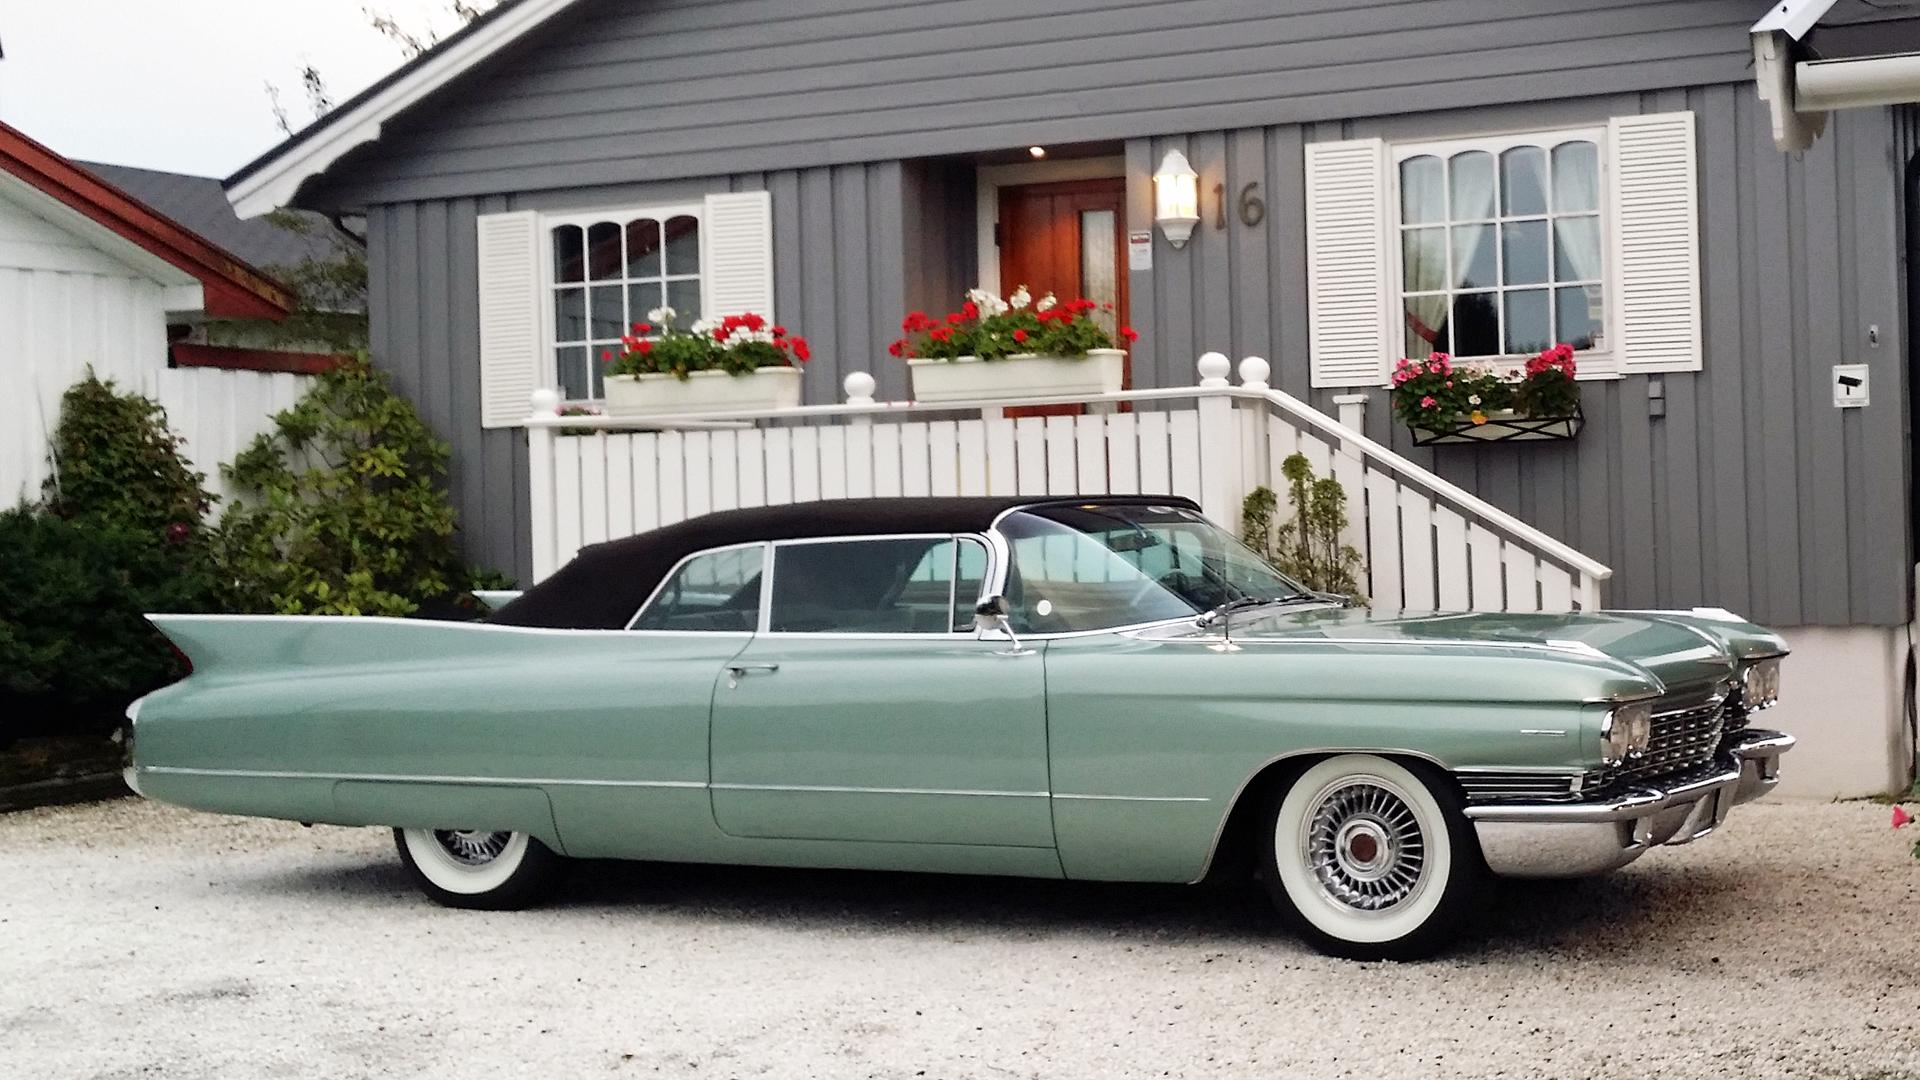 188-1960 Cadillac DeVille convertible 02. Eiere- m